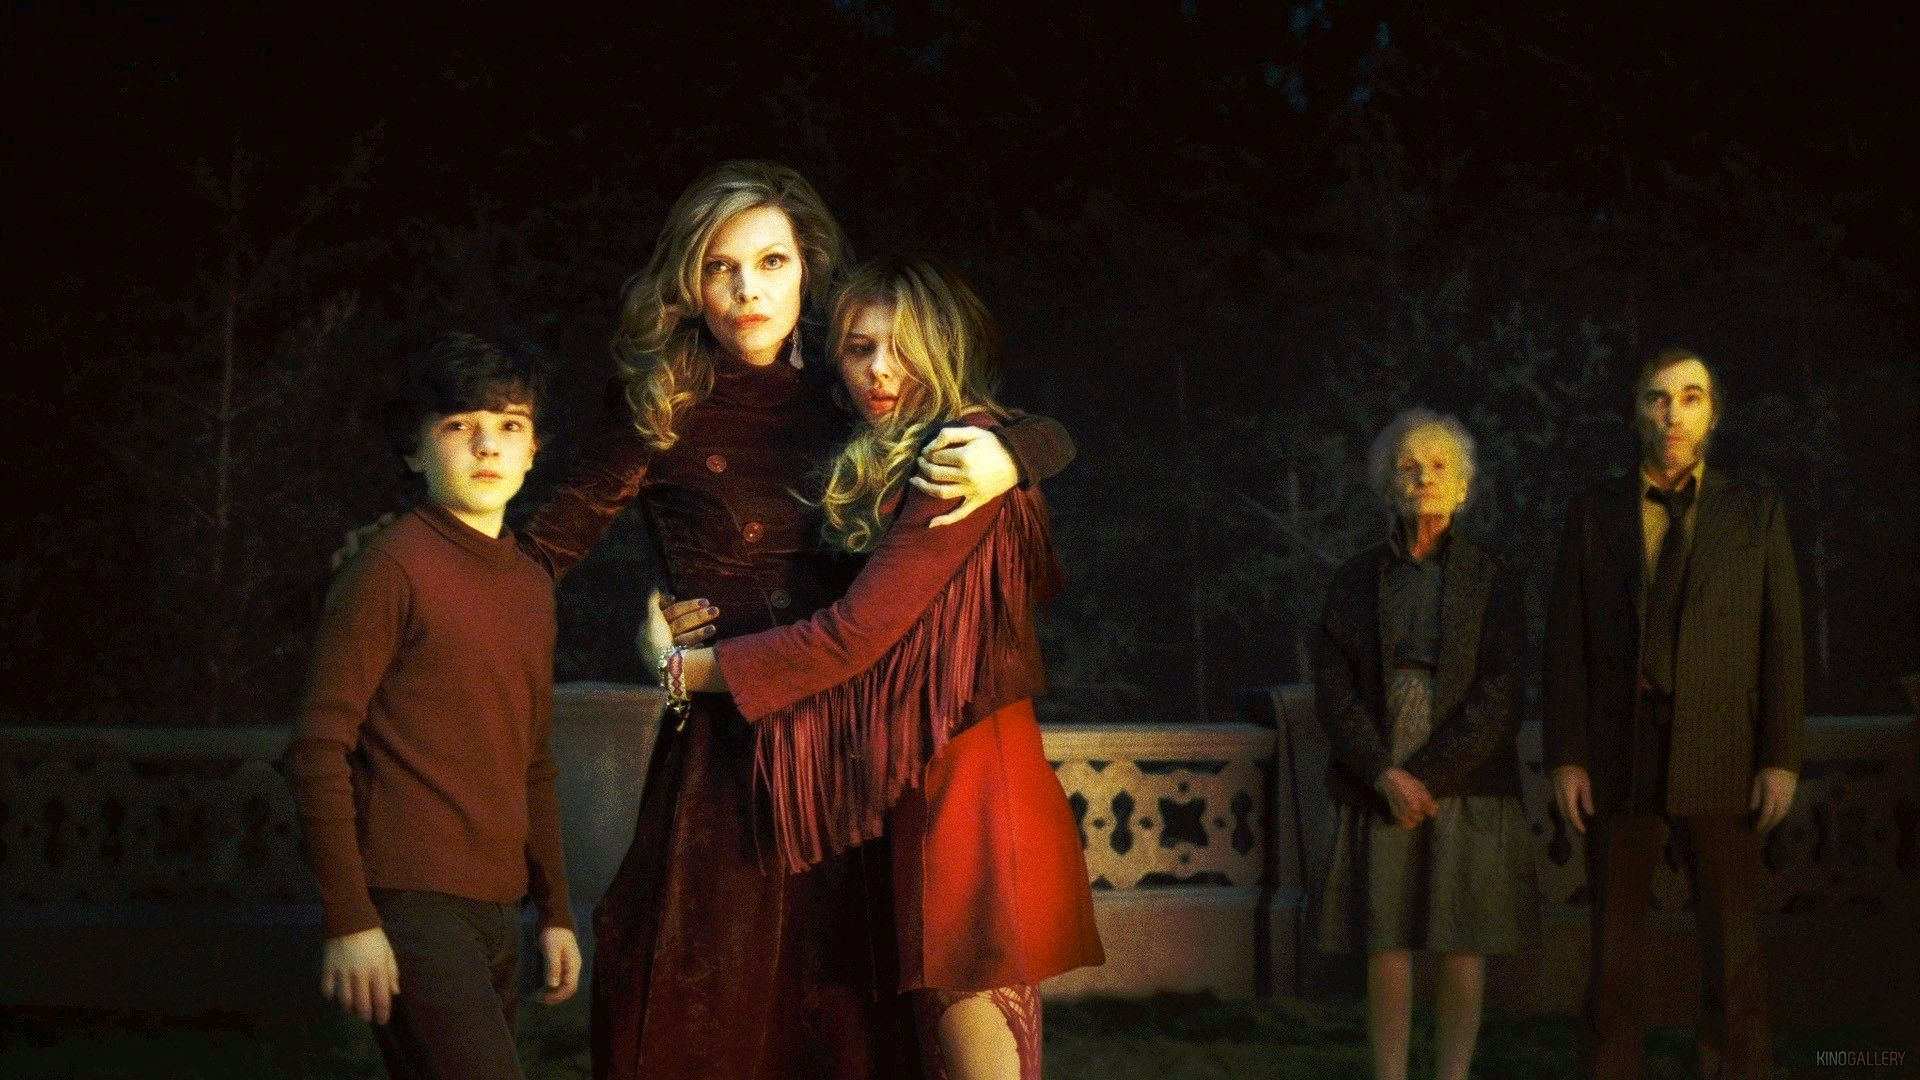 dark shadows 2012 full movie free download